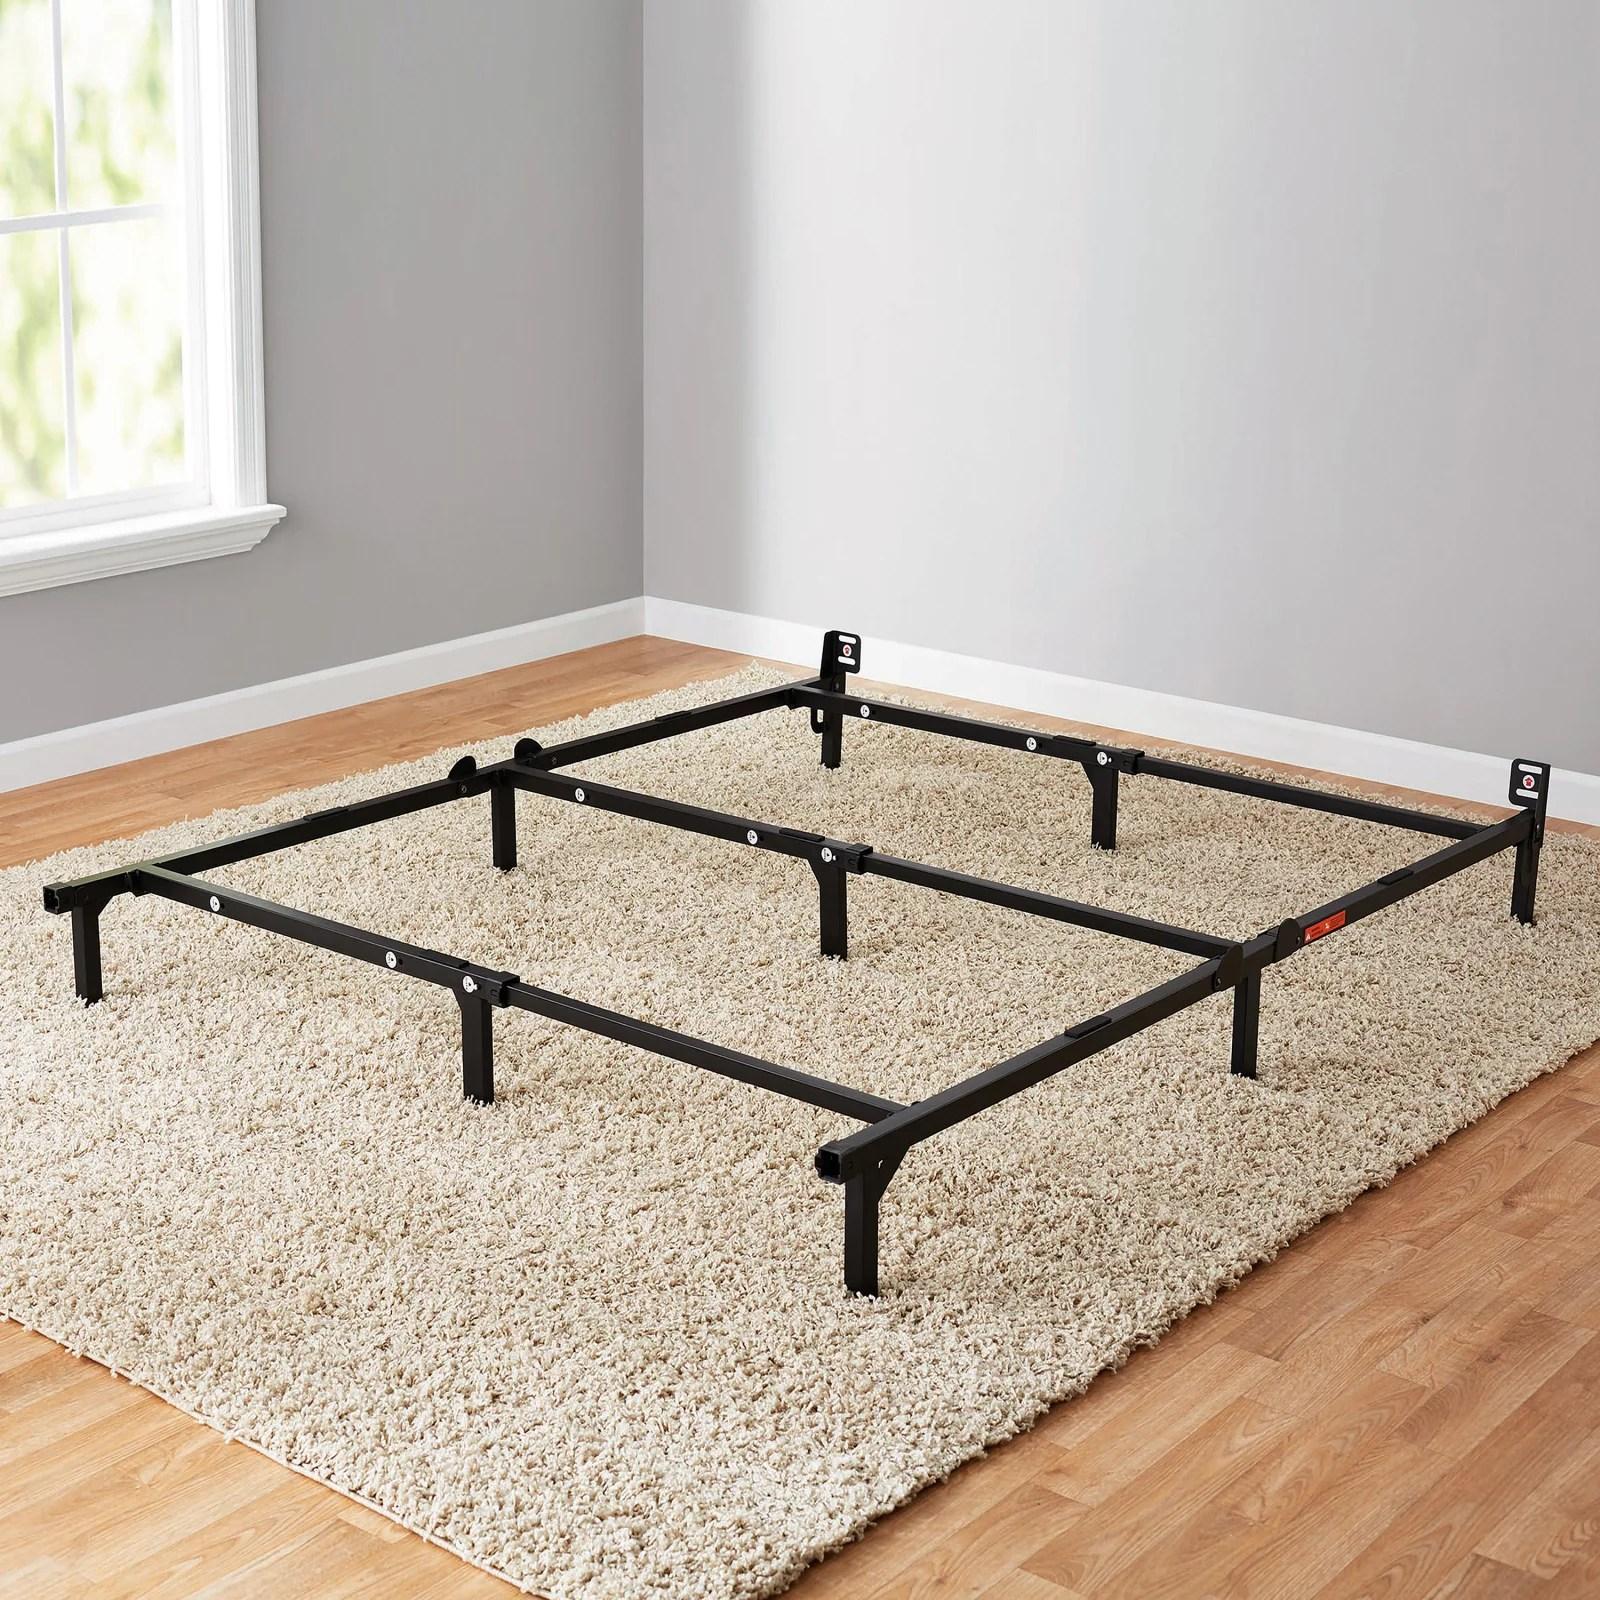 mainstays 7 adjustable bed